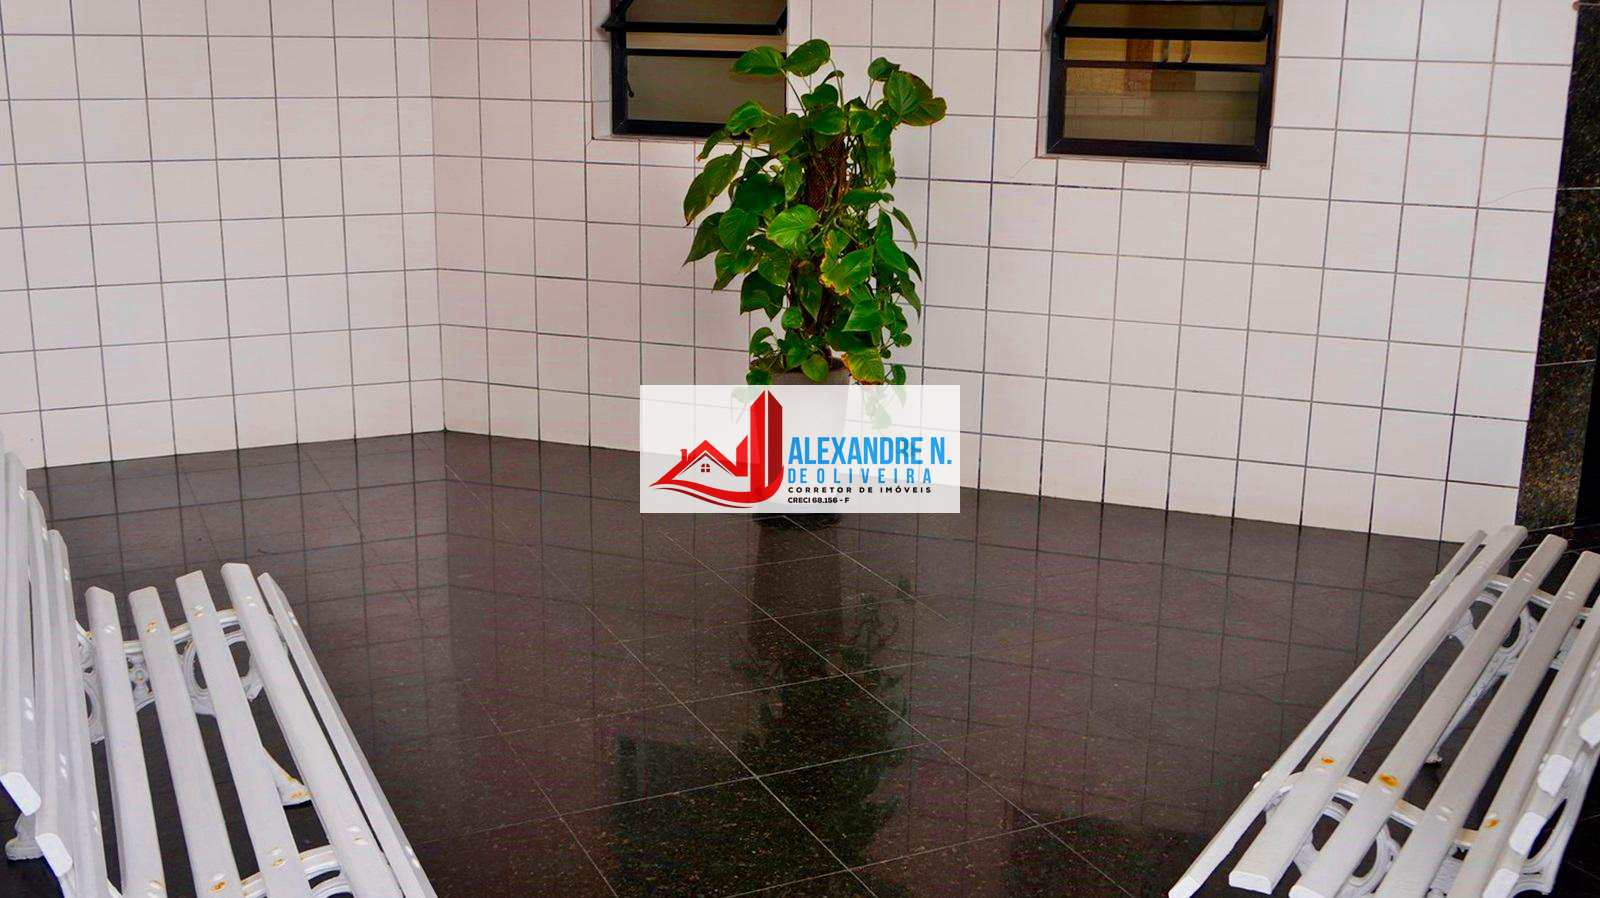 Apartamento 1 dorm, Ocian, Praia Grande - R$ 150 mil, AP00523.